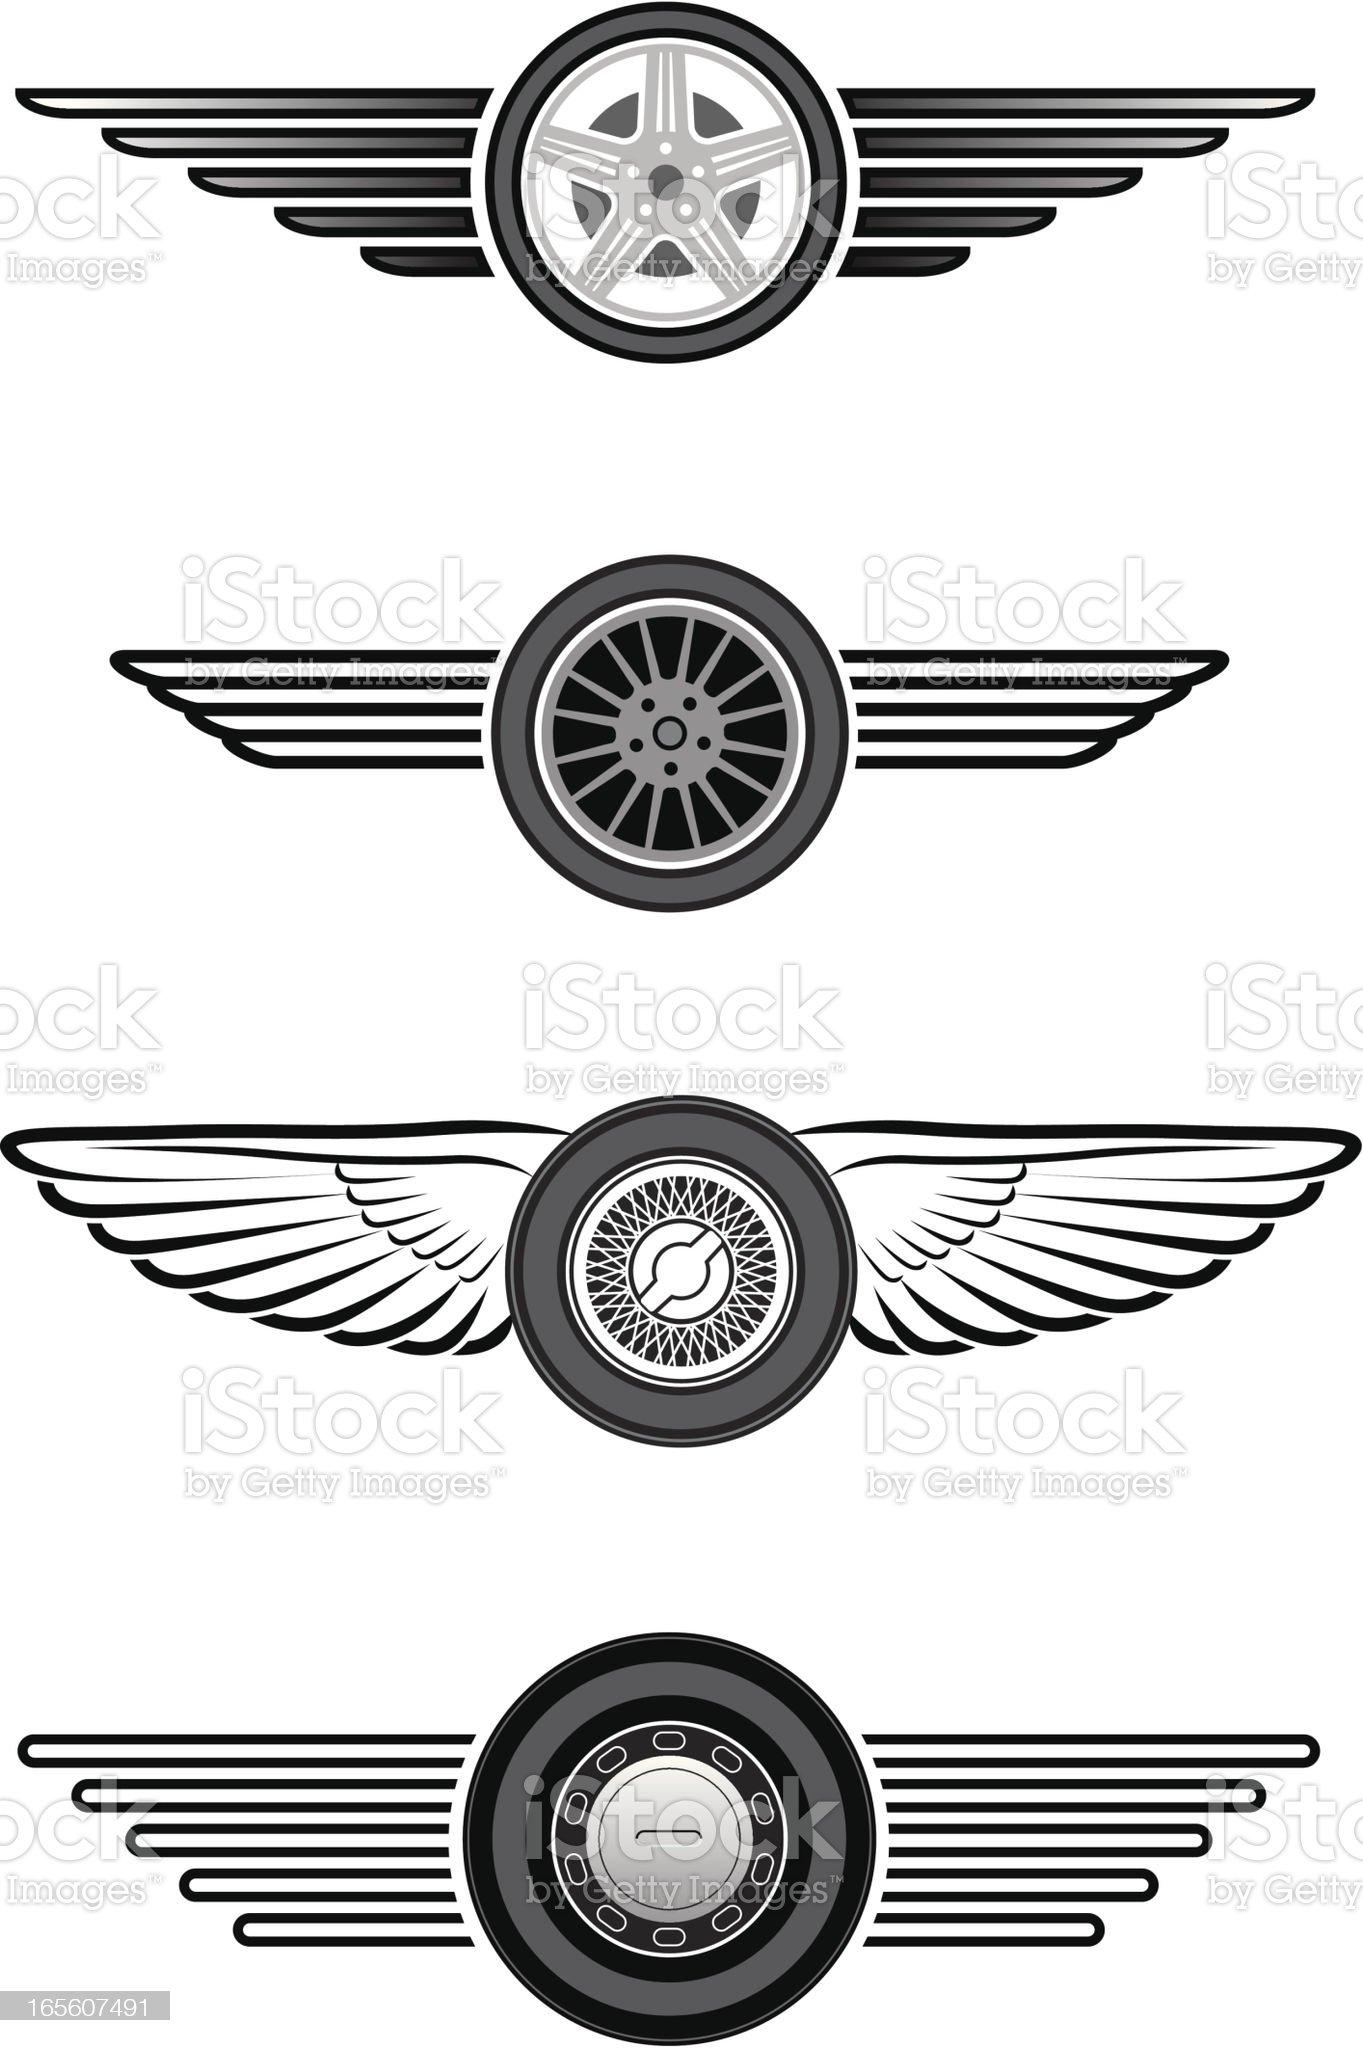 Winged wheels royalty-free stock vector art